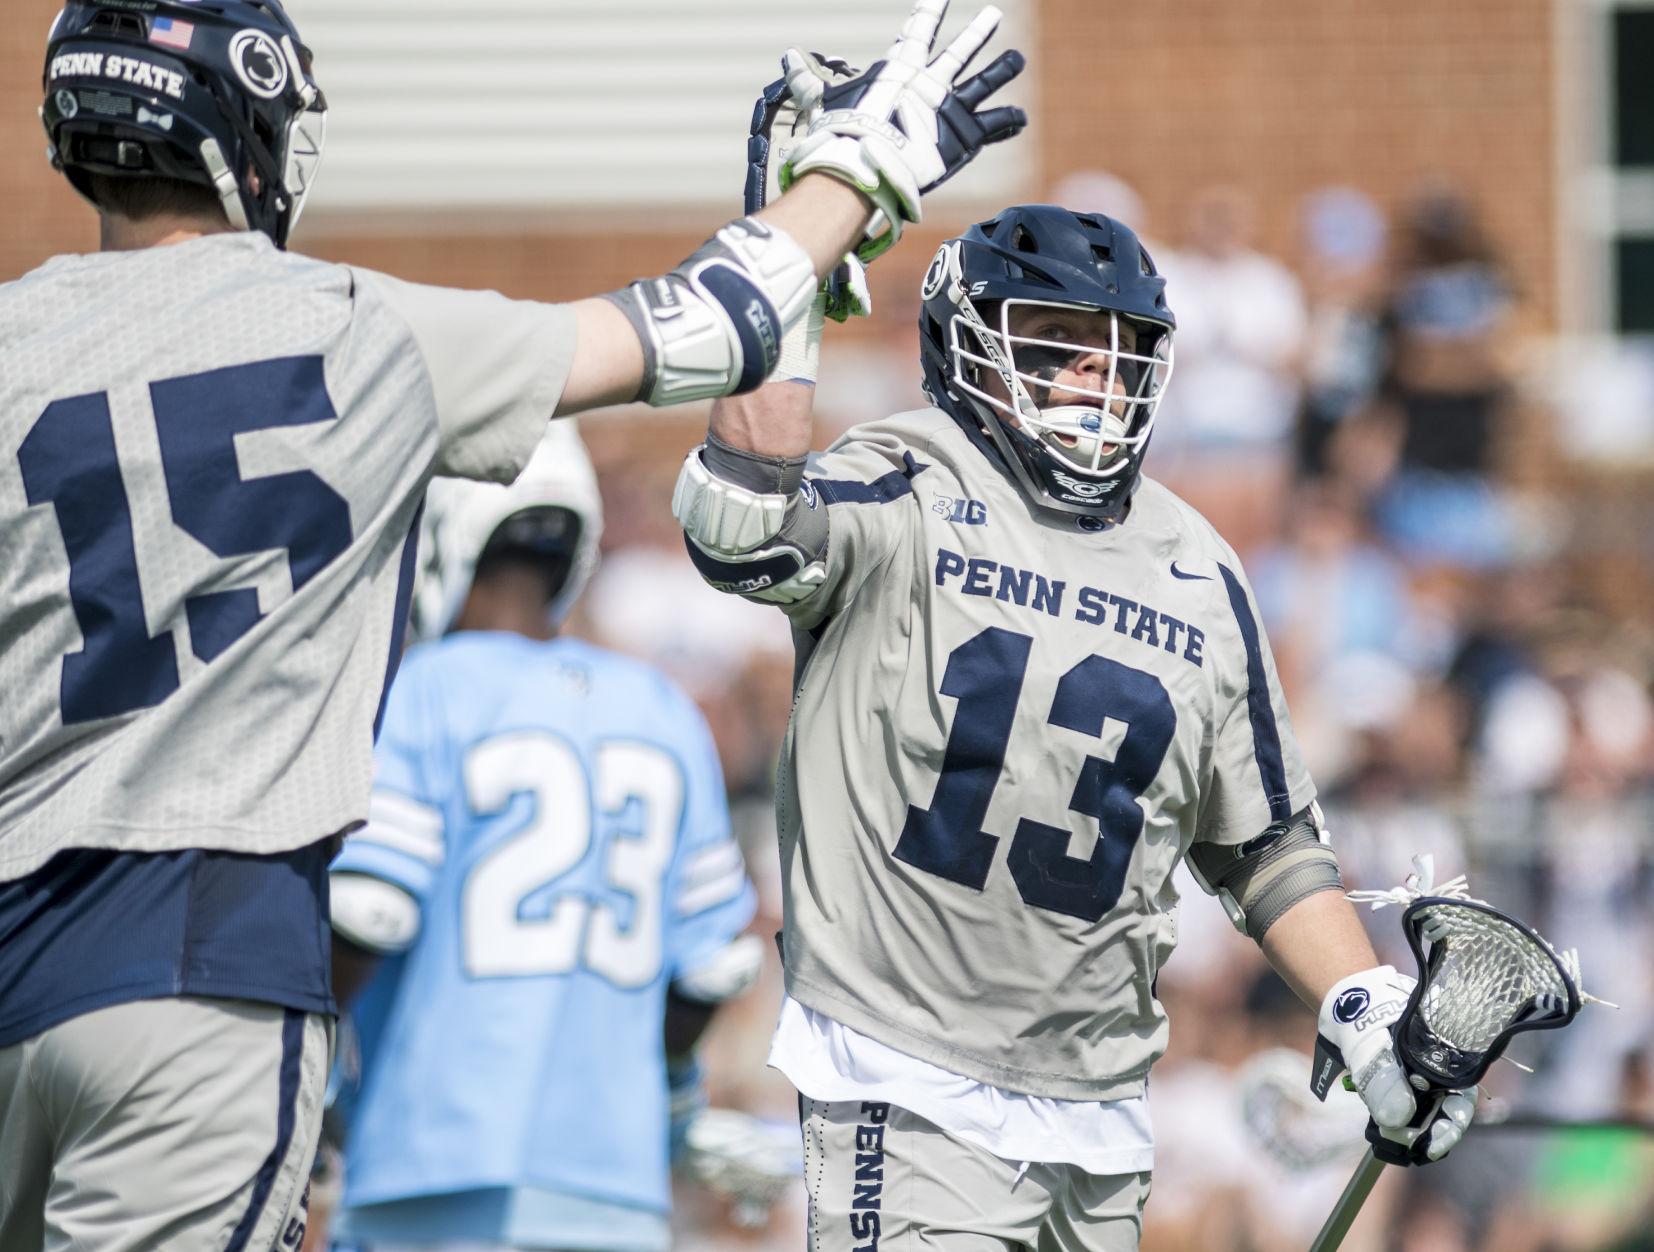 Penn State men's lacrosse moves up to No. 11 in Maverik Media Poll ...